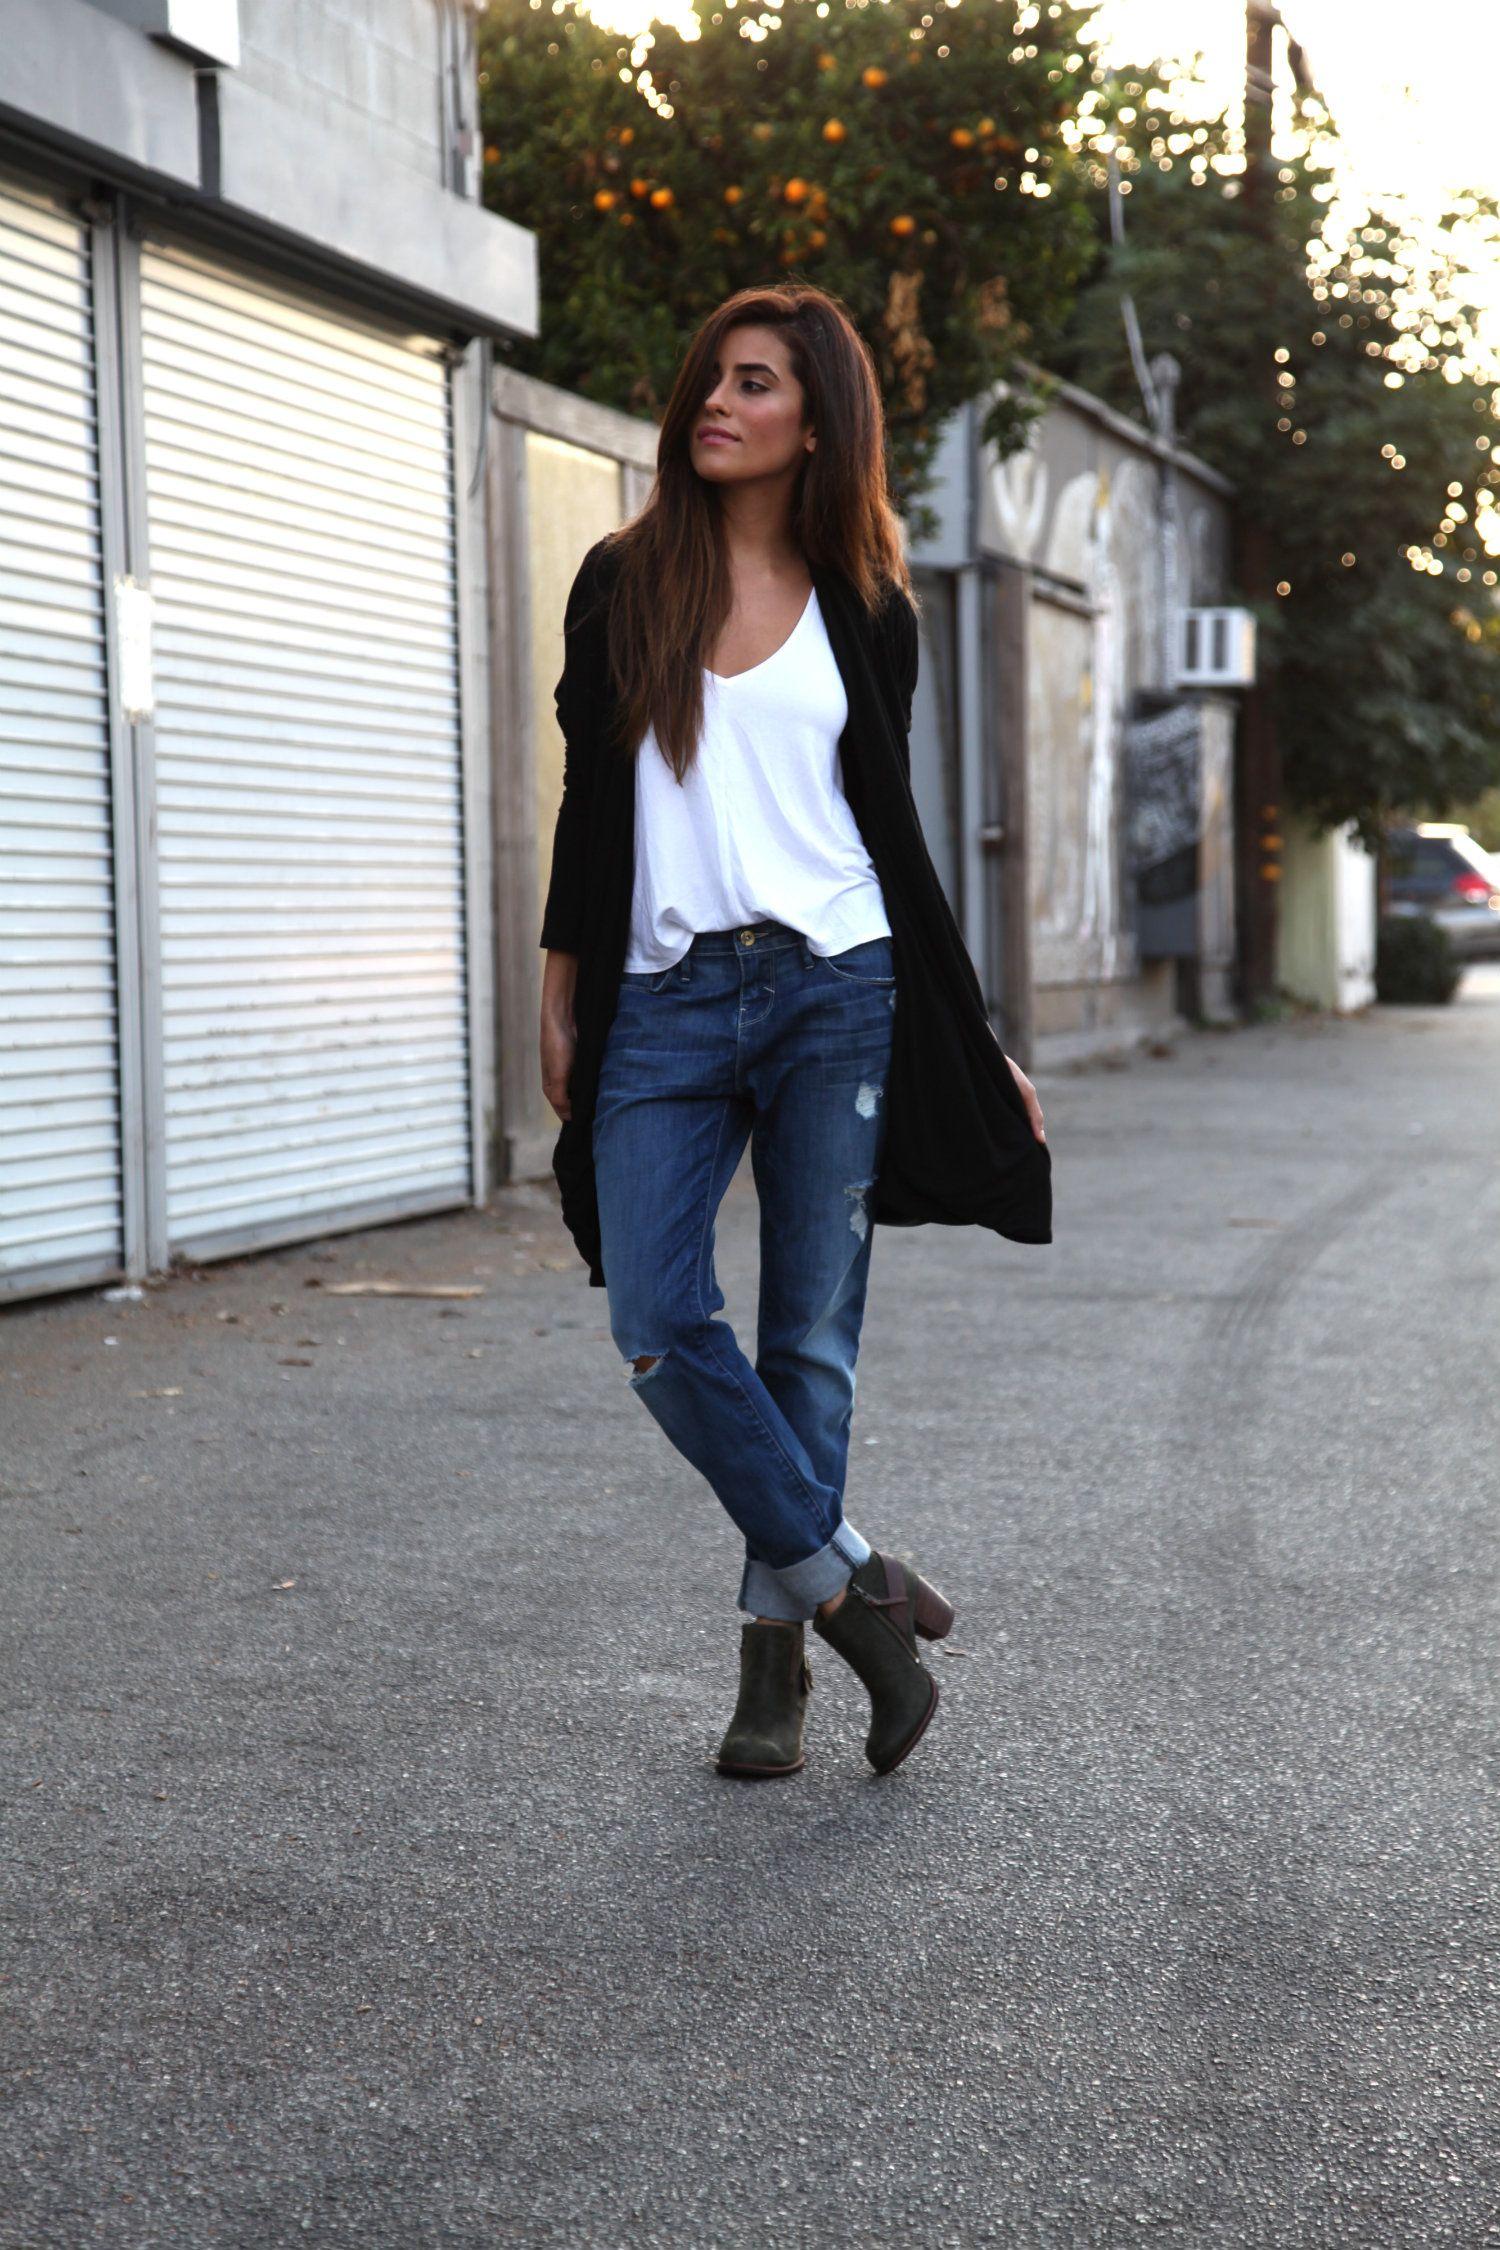 sazan-fall-style | Sazan | Pinterest | Boyfriend jeans, Ankle ...